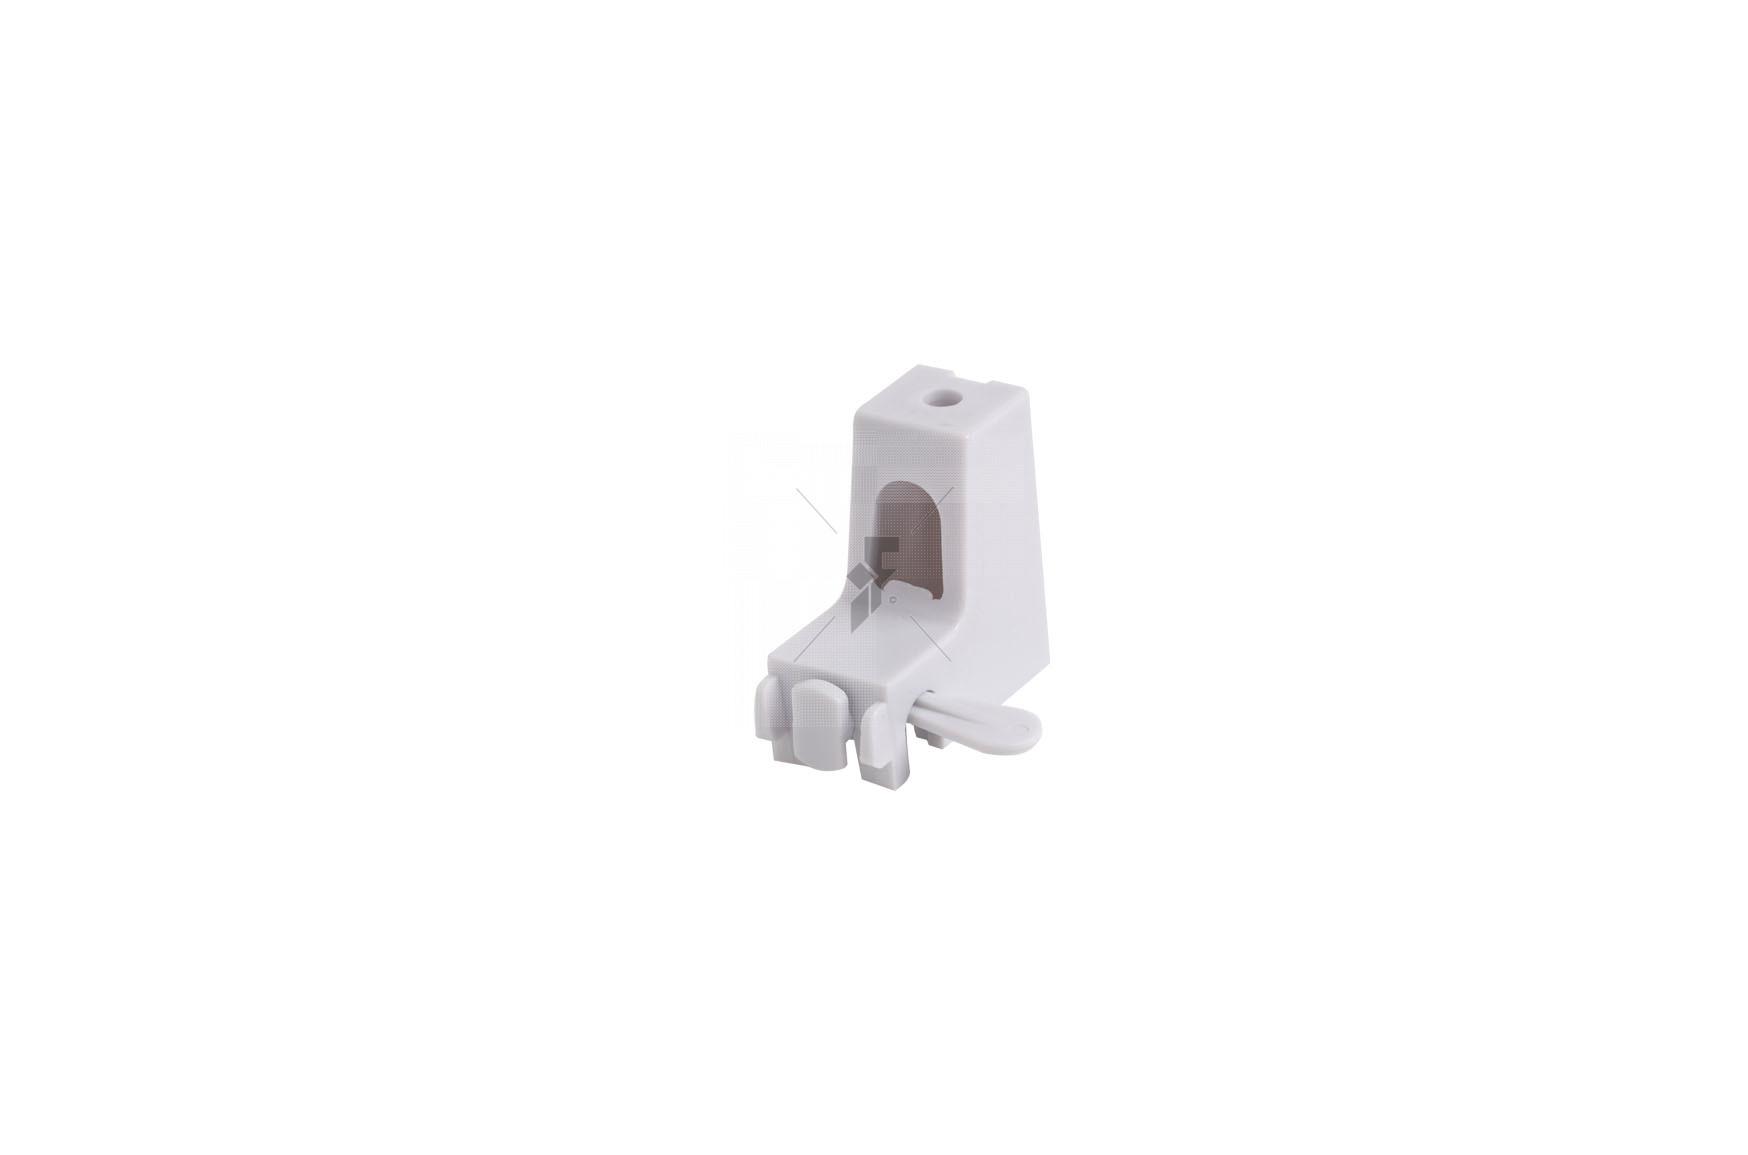 Streamline Key Lock Support Pk4  - White